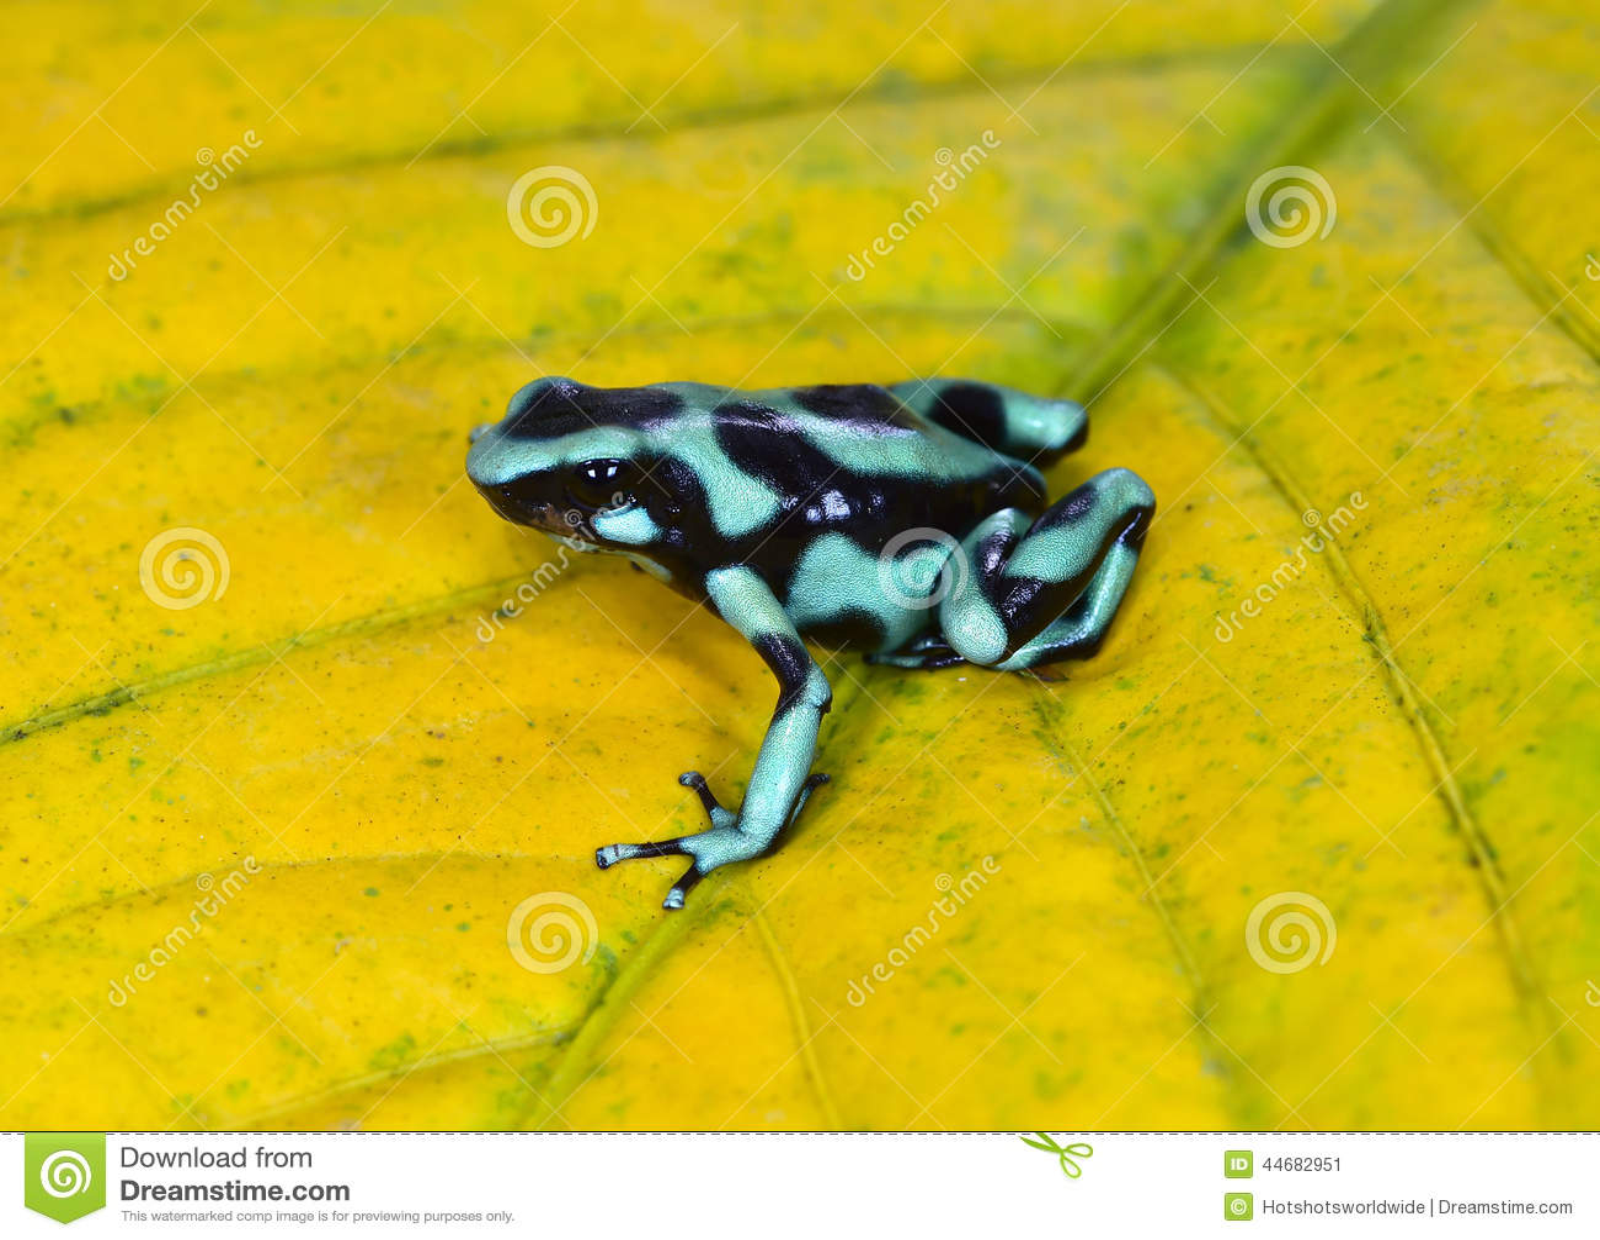 Grenouille Costa Rica grenouille verte et noire de dard de poison, costa rica image stock